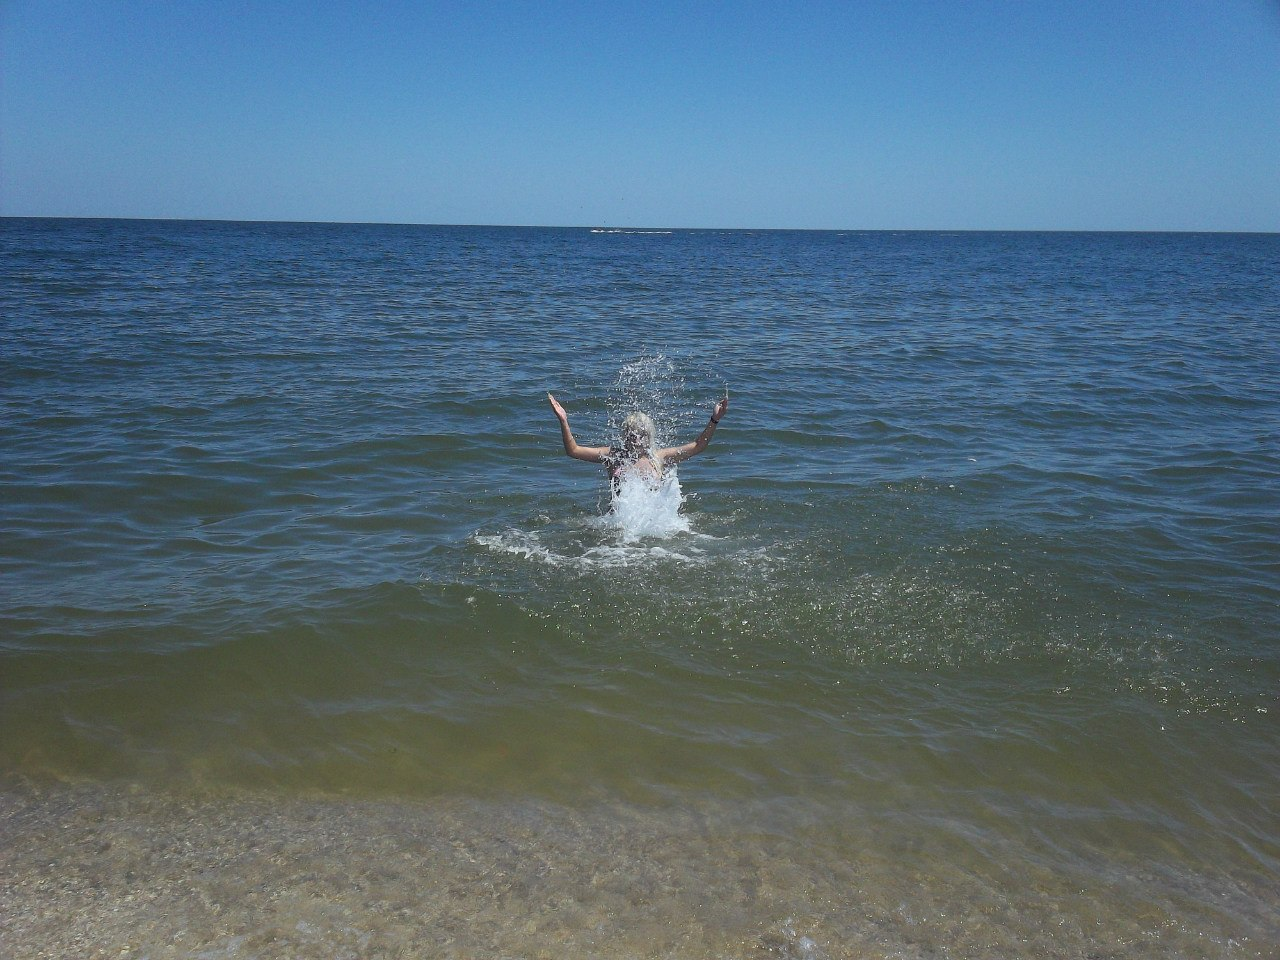 Азовское море. Бердянск. 2012 г. 7ZMCnU1NFV0